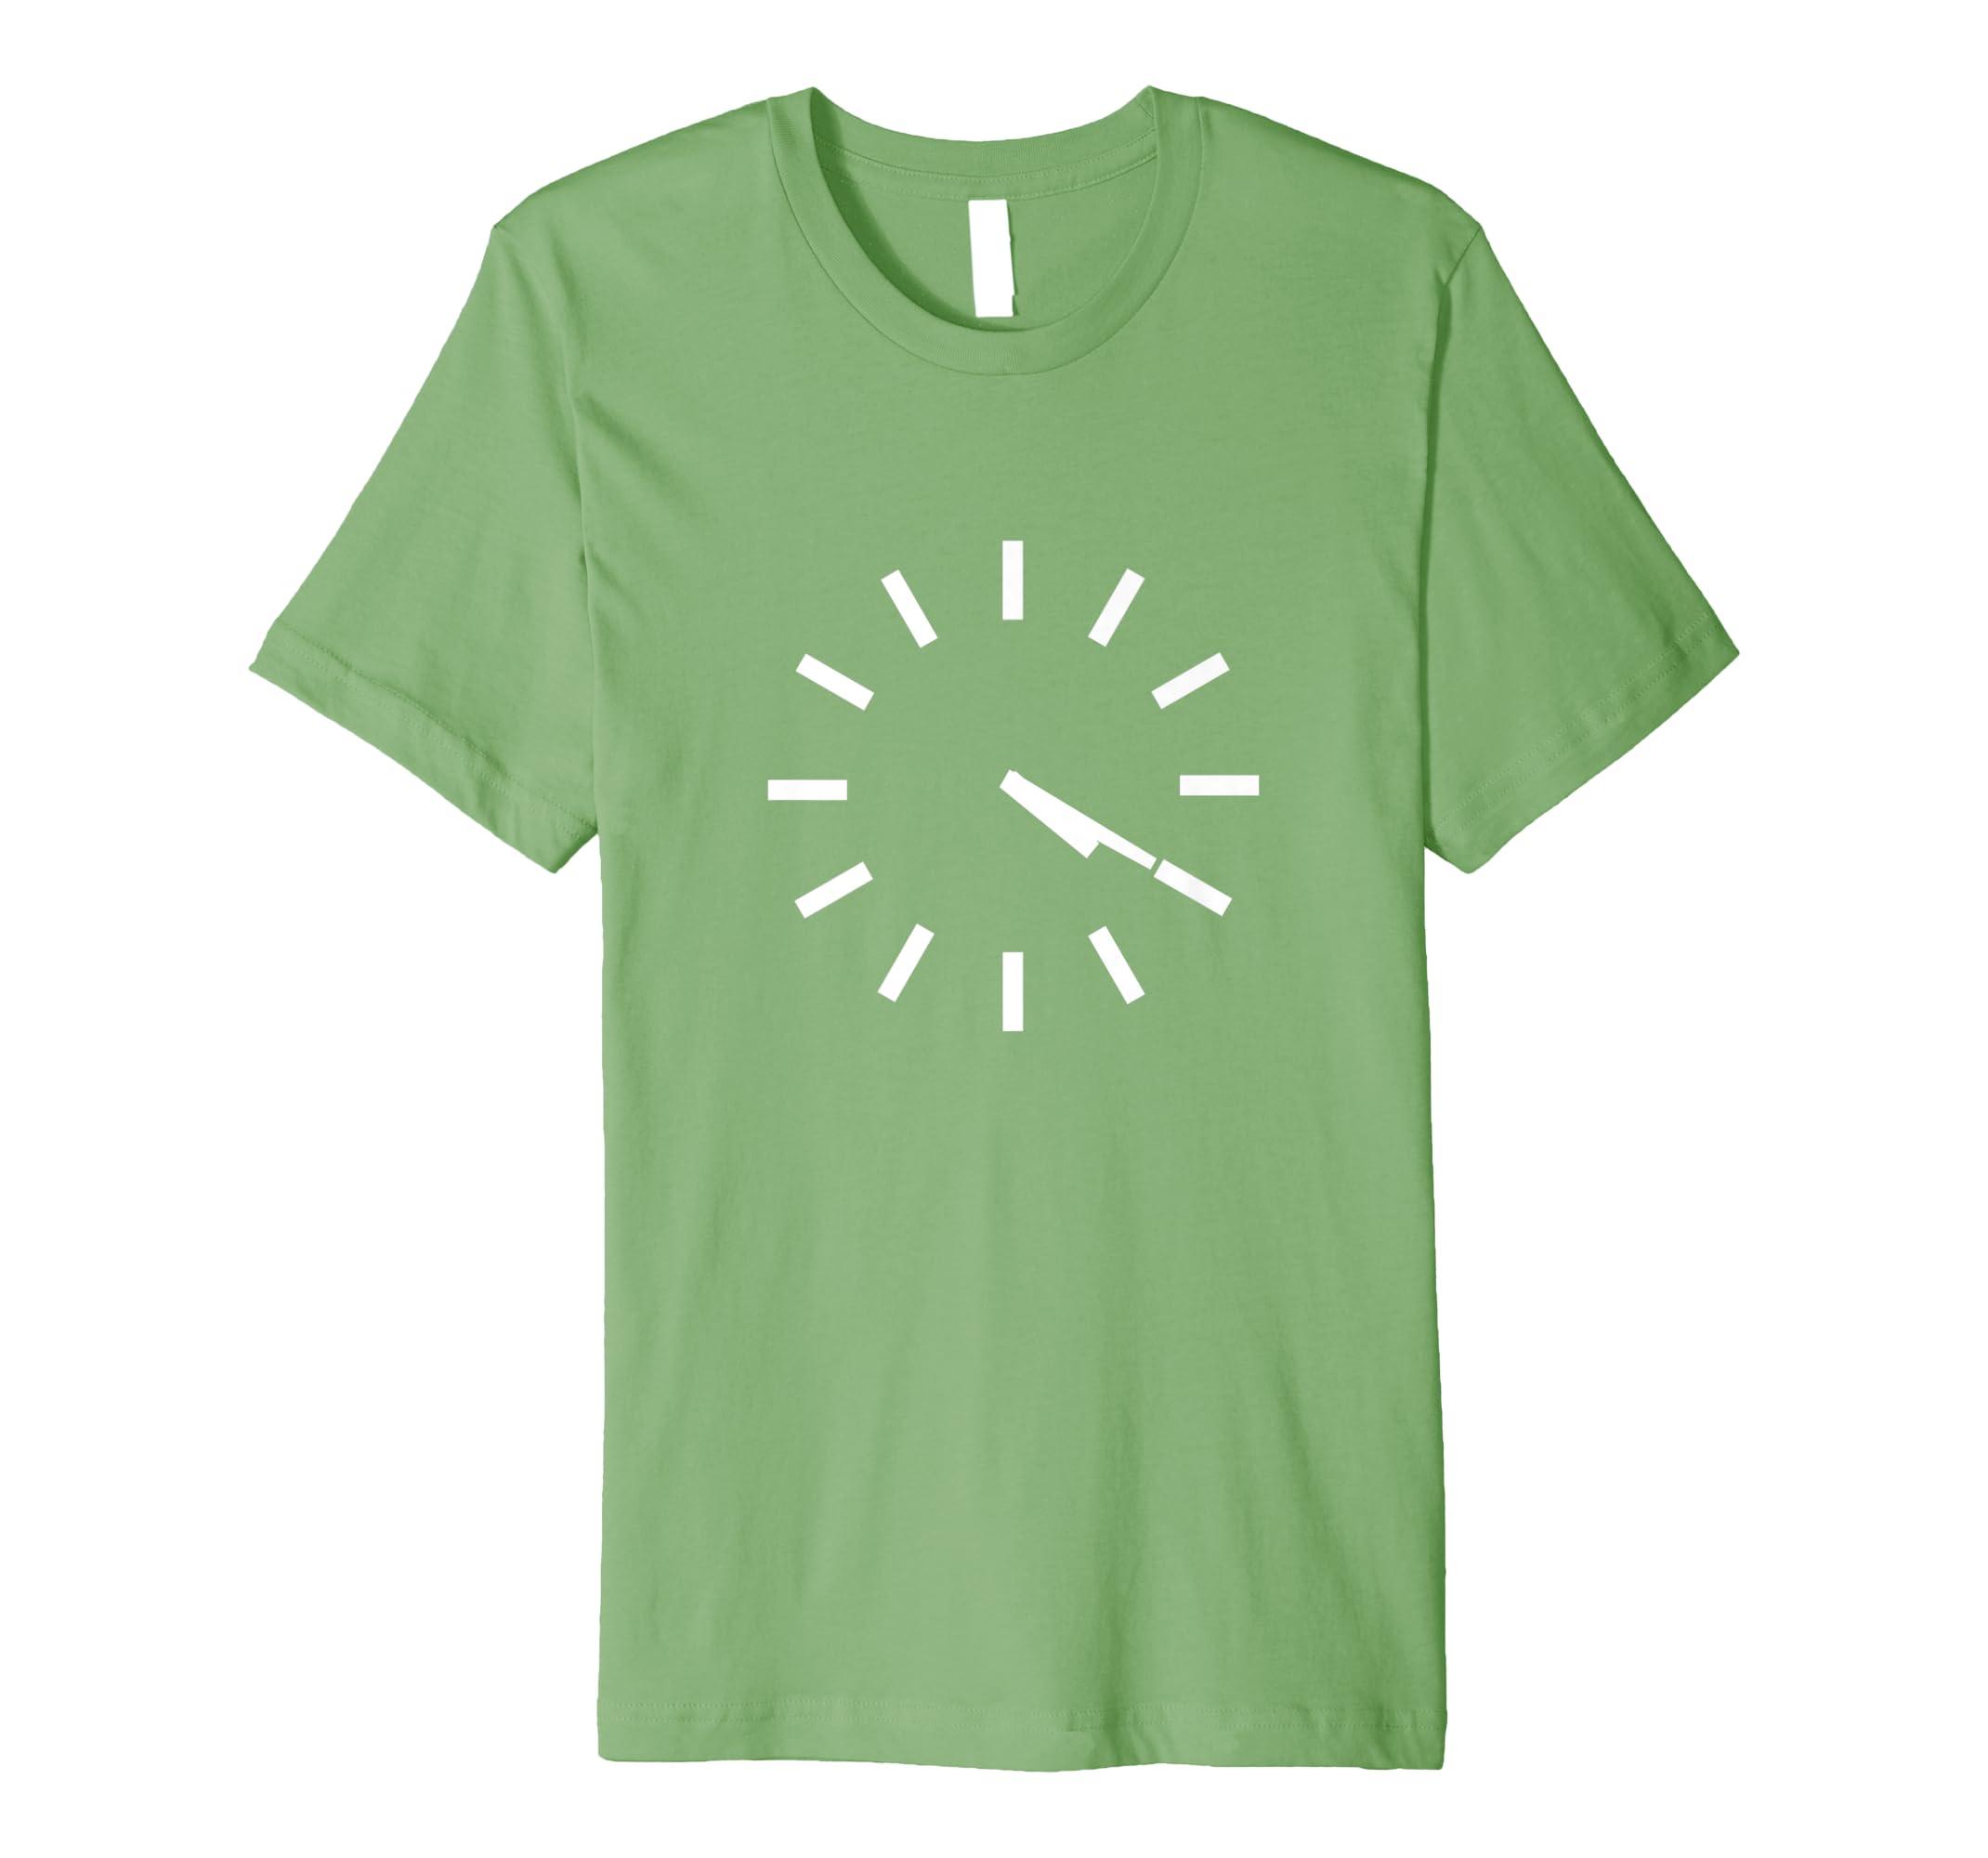 41023307086 Amazon.com  420 T Shirt - A More Subtle Stoner T-Shirt  Clothing